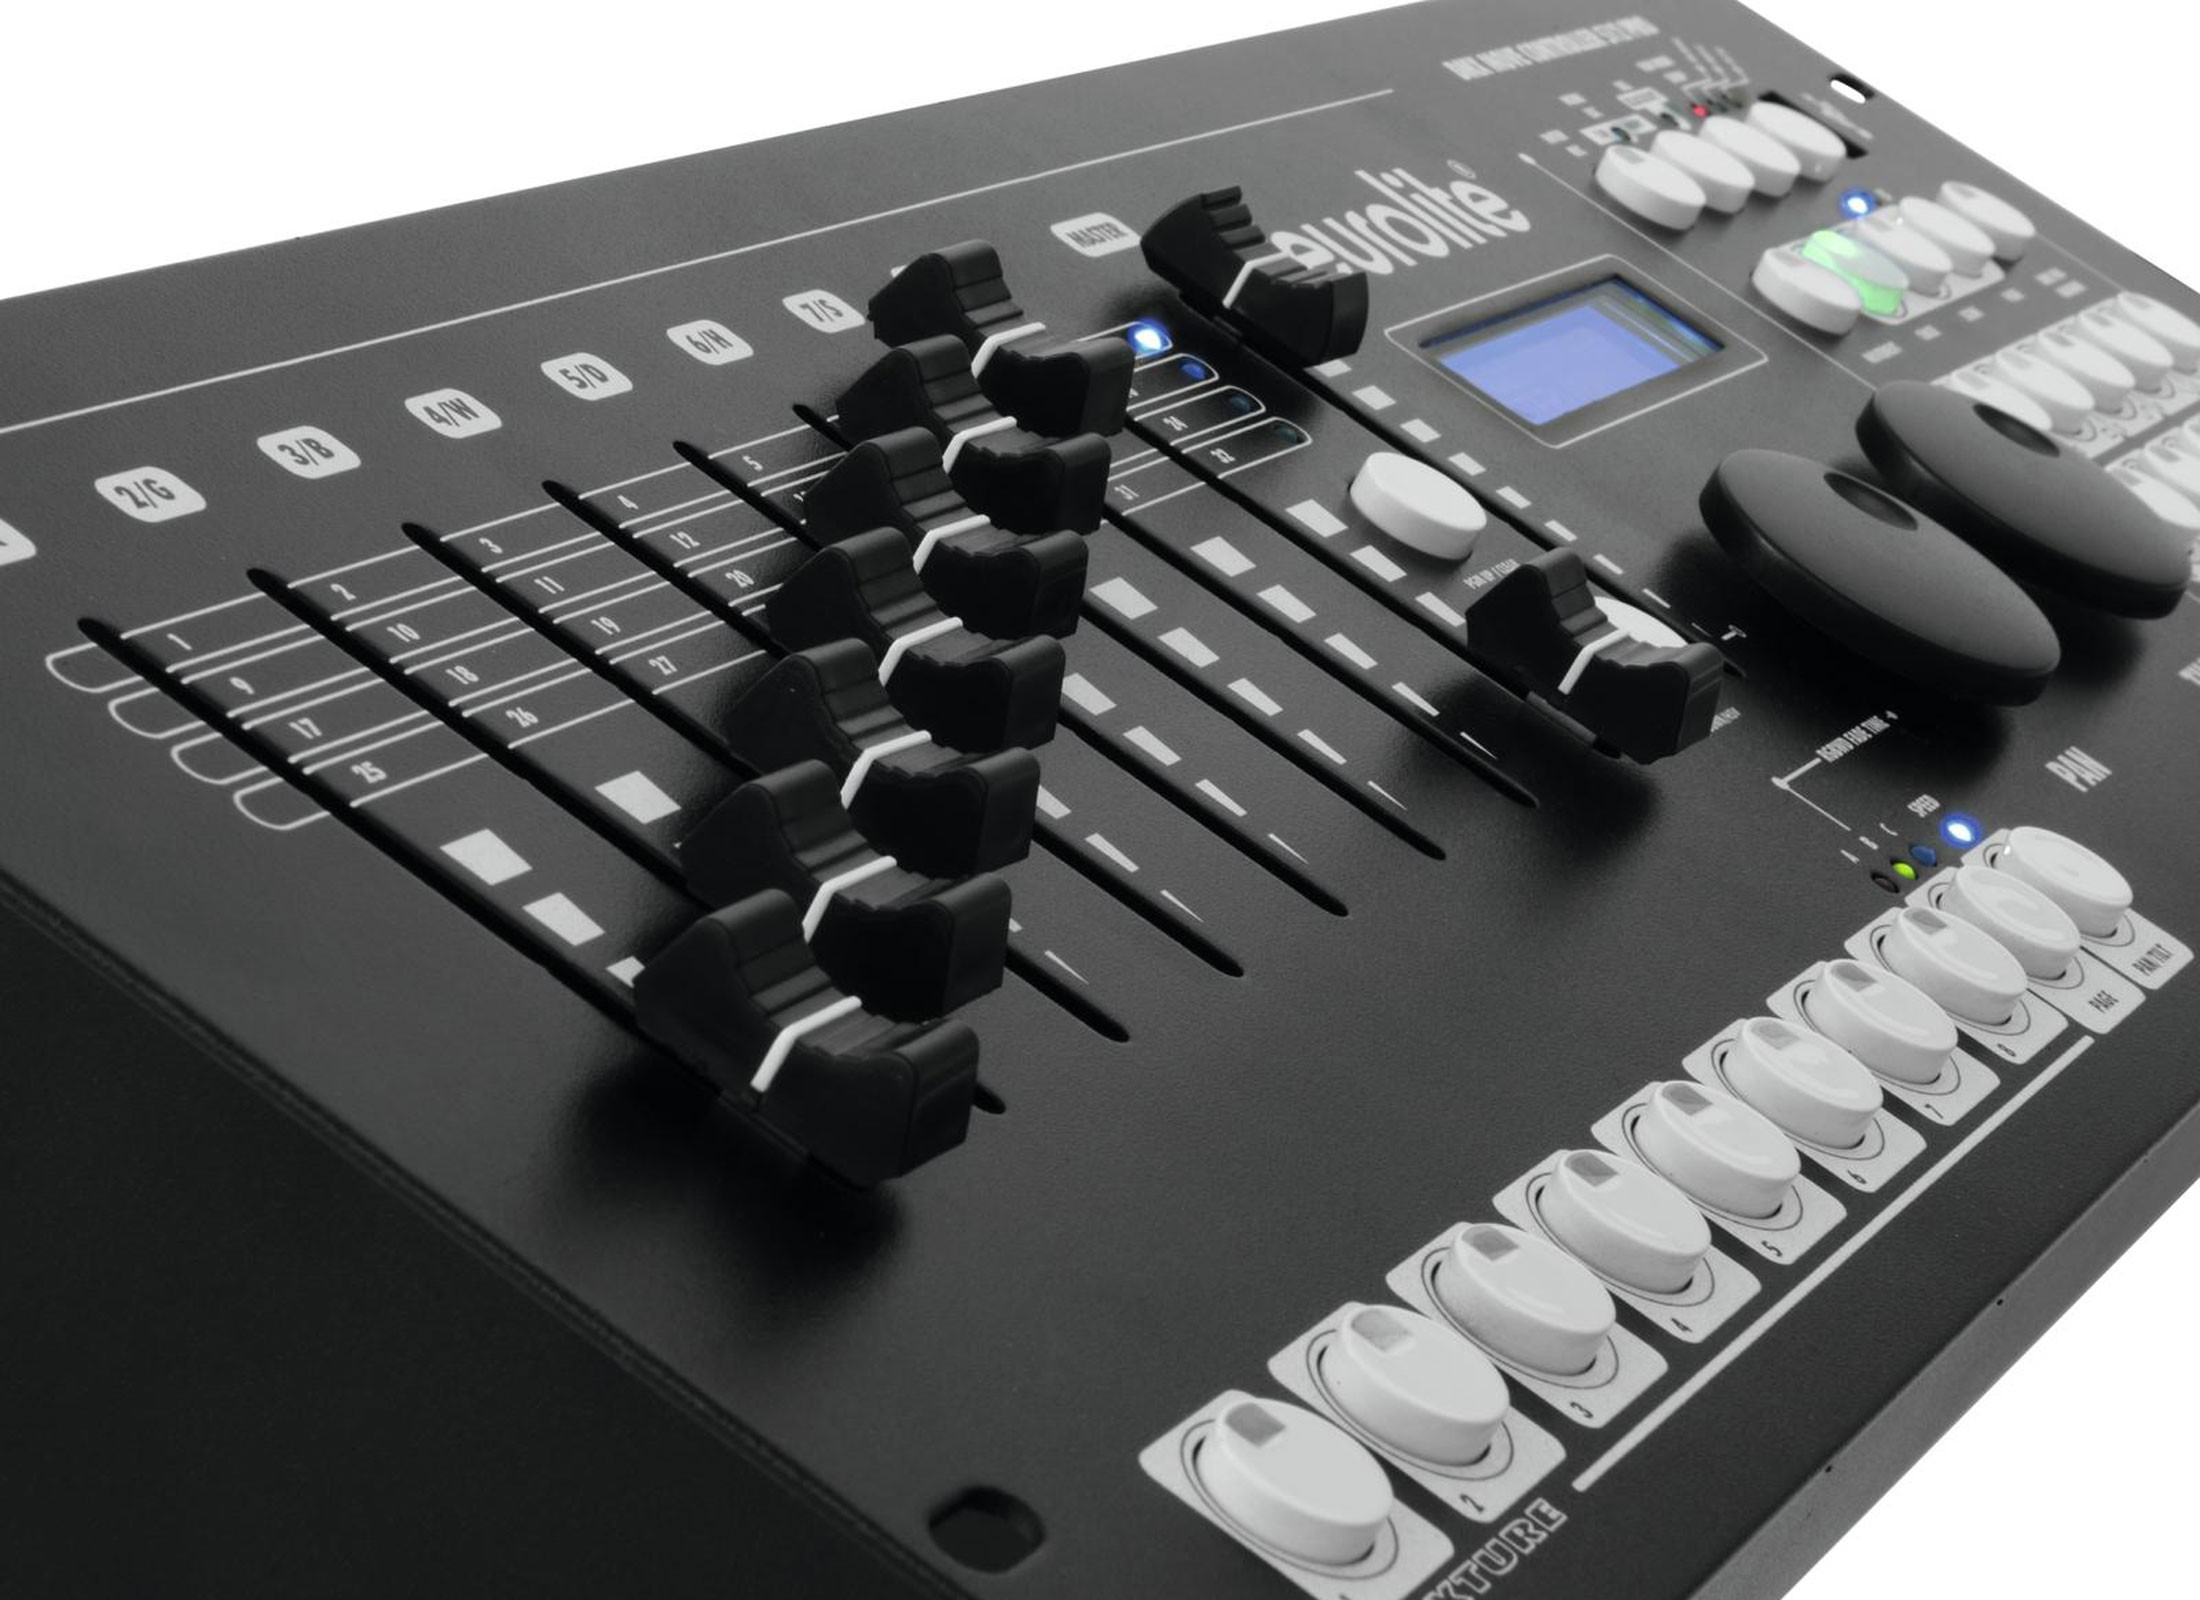 Eurolite Dmx Move Control 512 Pro Dmx Controller Online At